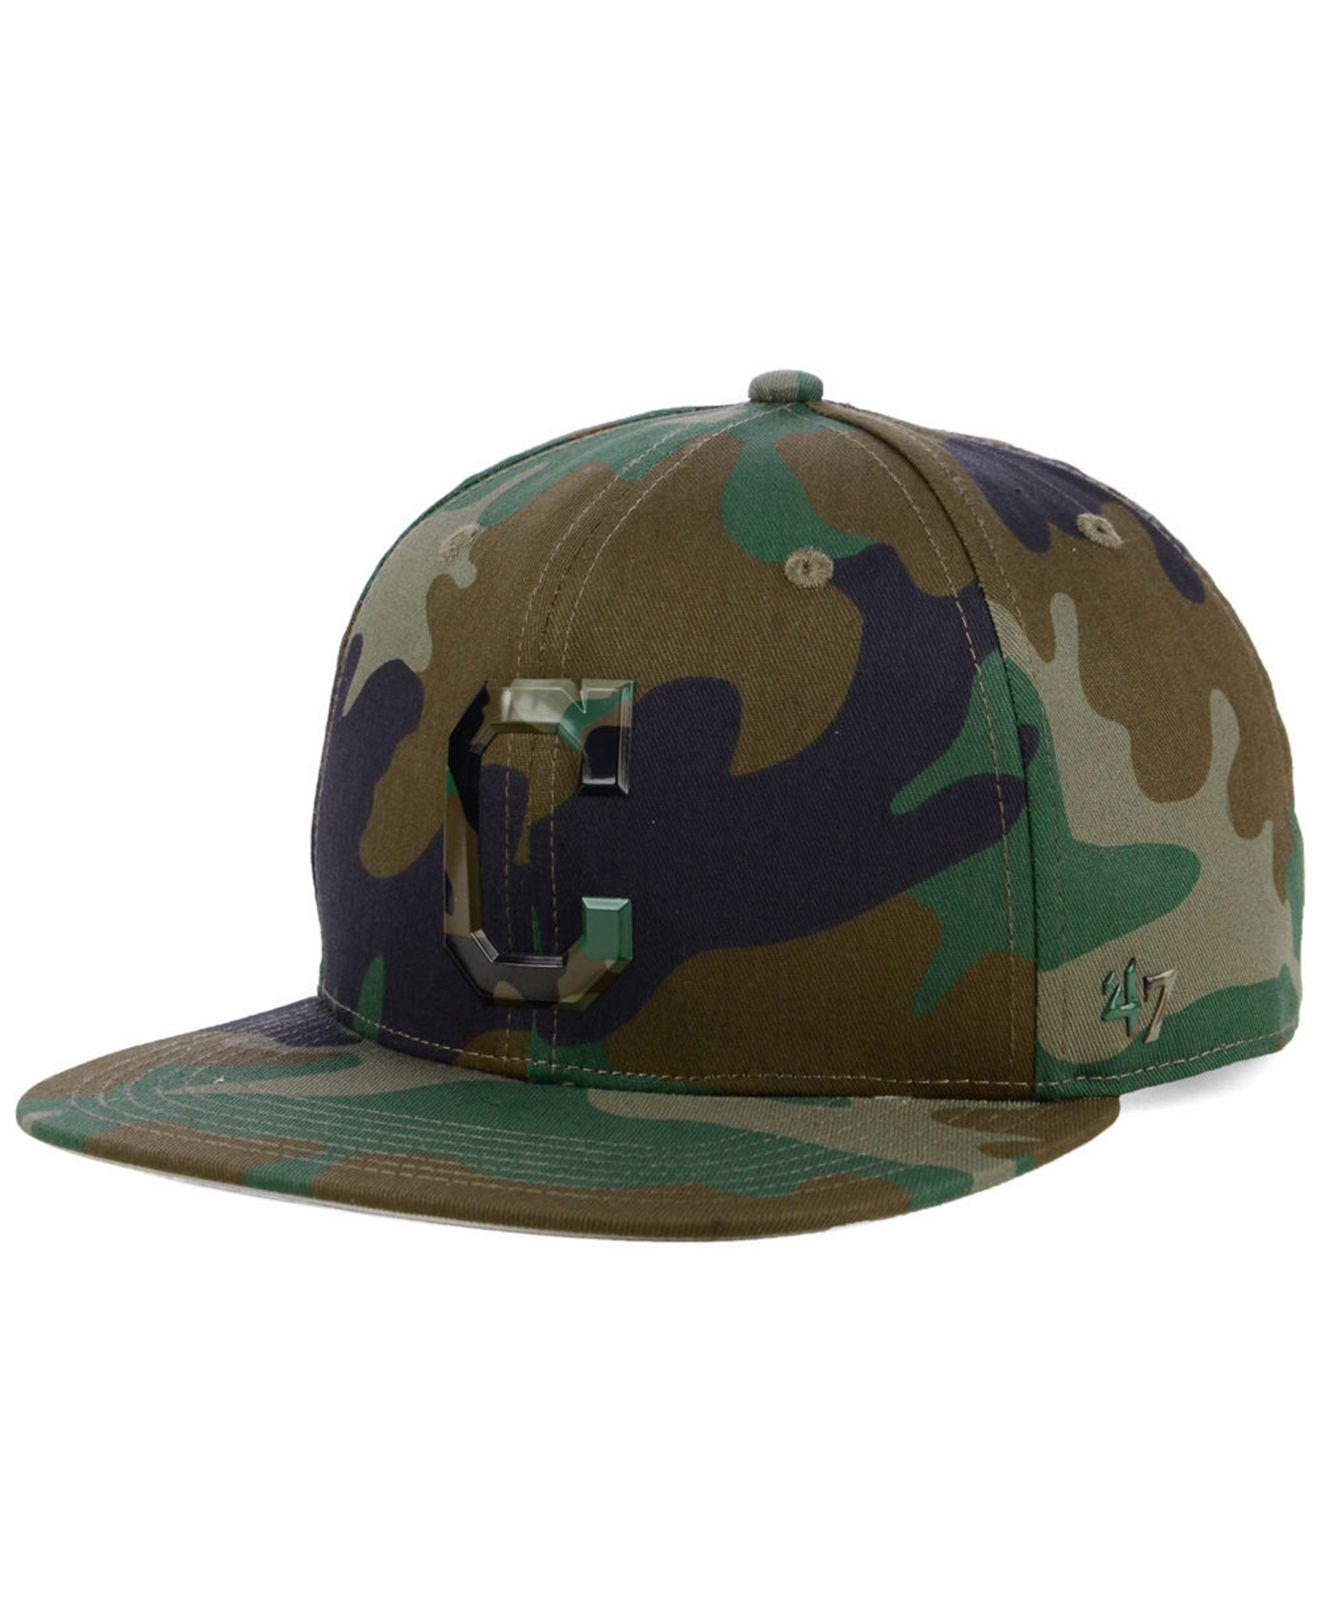 newest 430a3 685f6 ... Cleveland Indians Camo Snapback Cap for Men - Lyst. View fullscreen